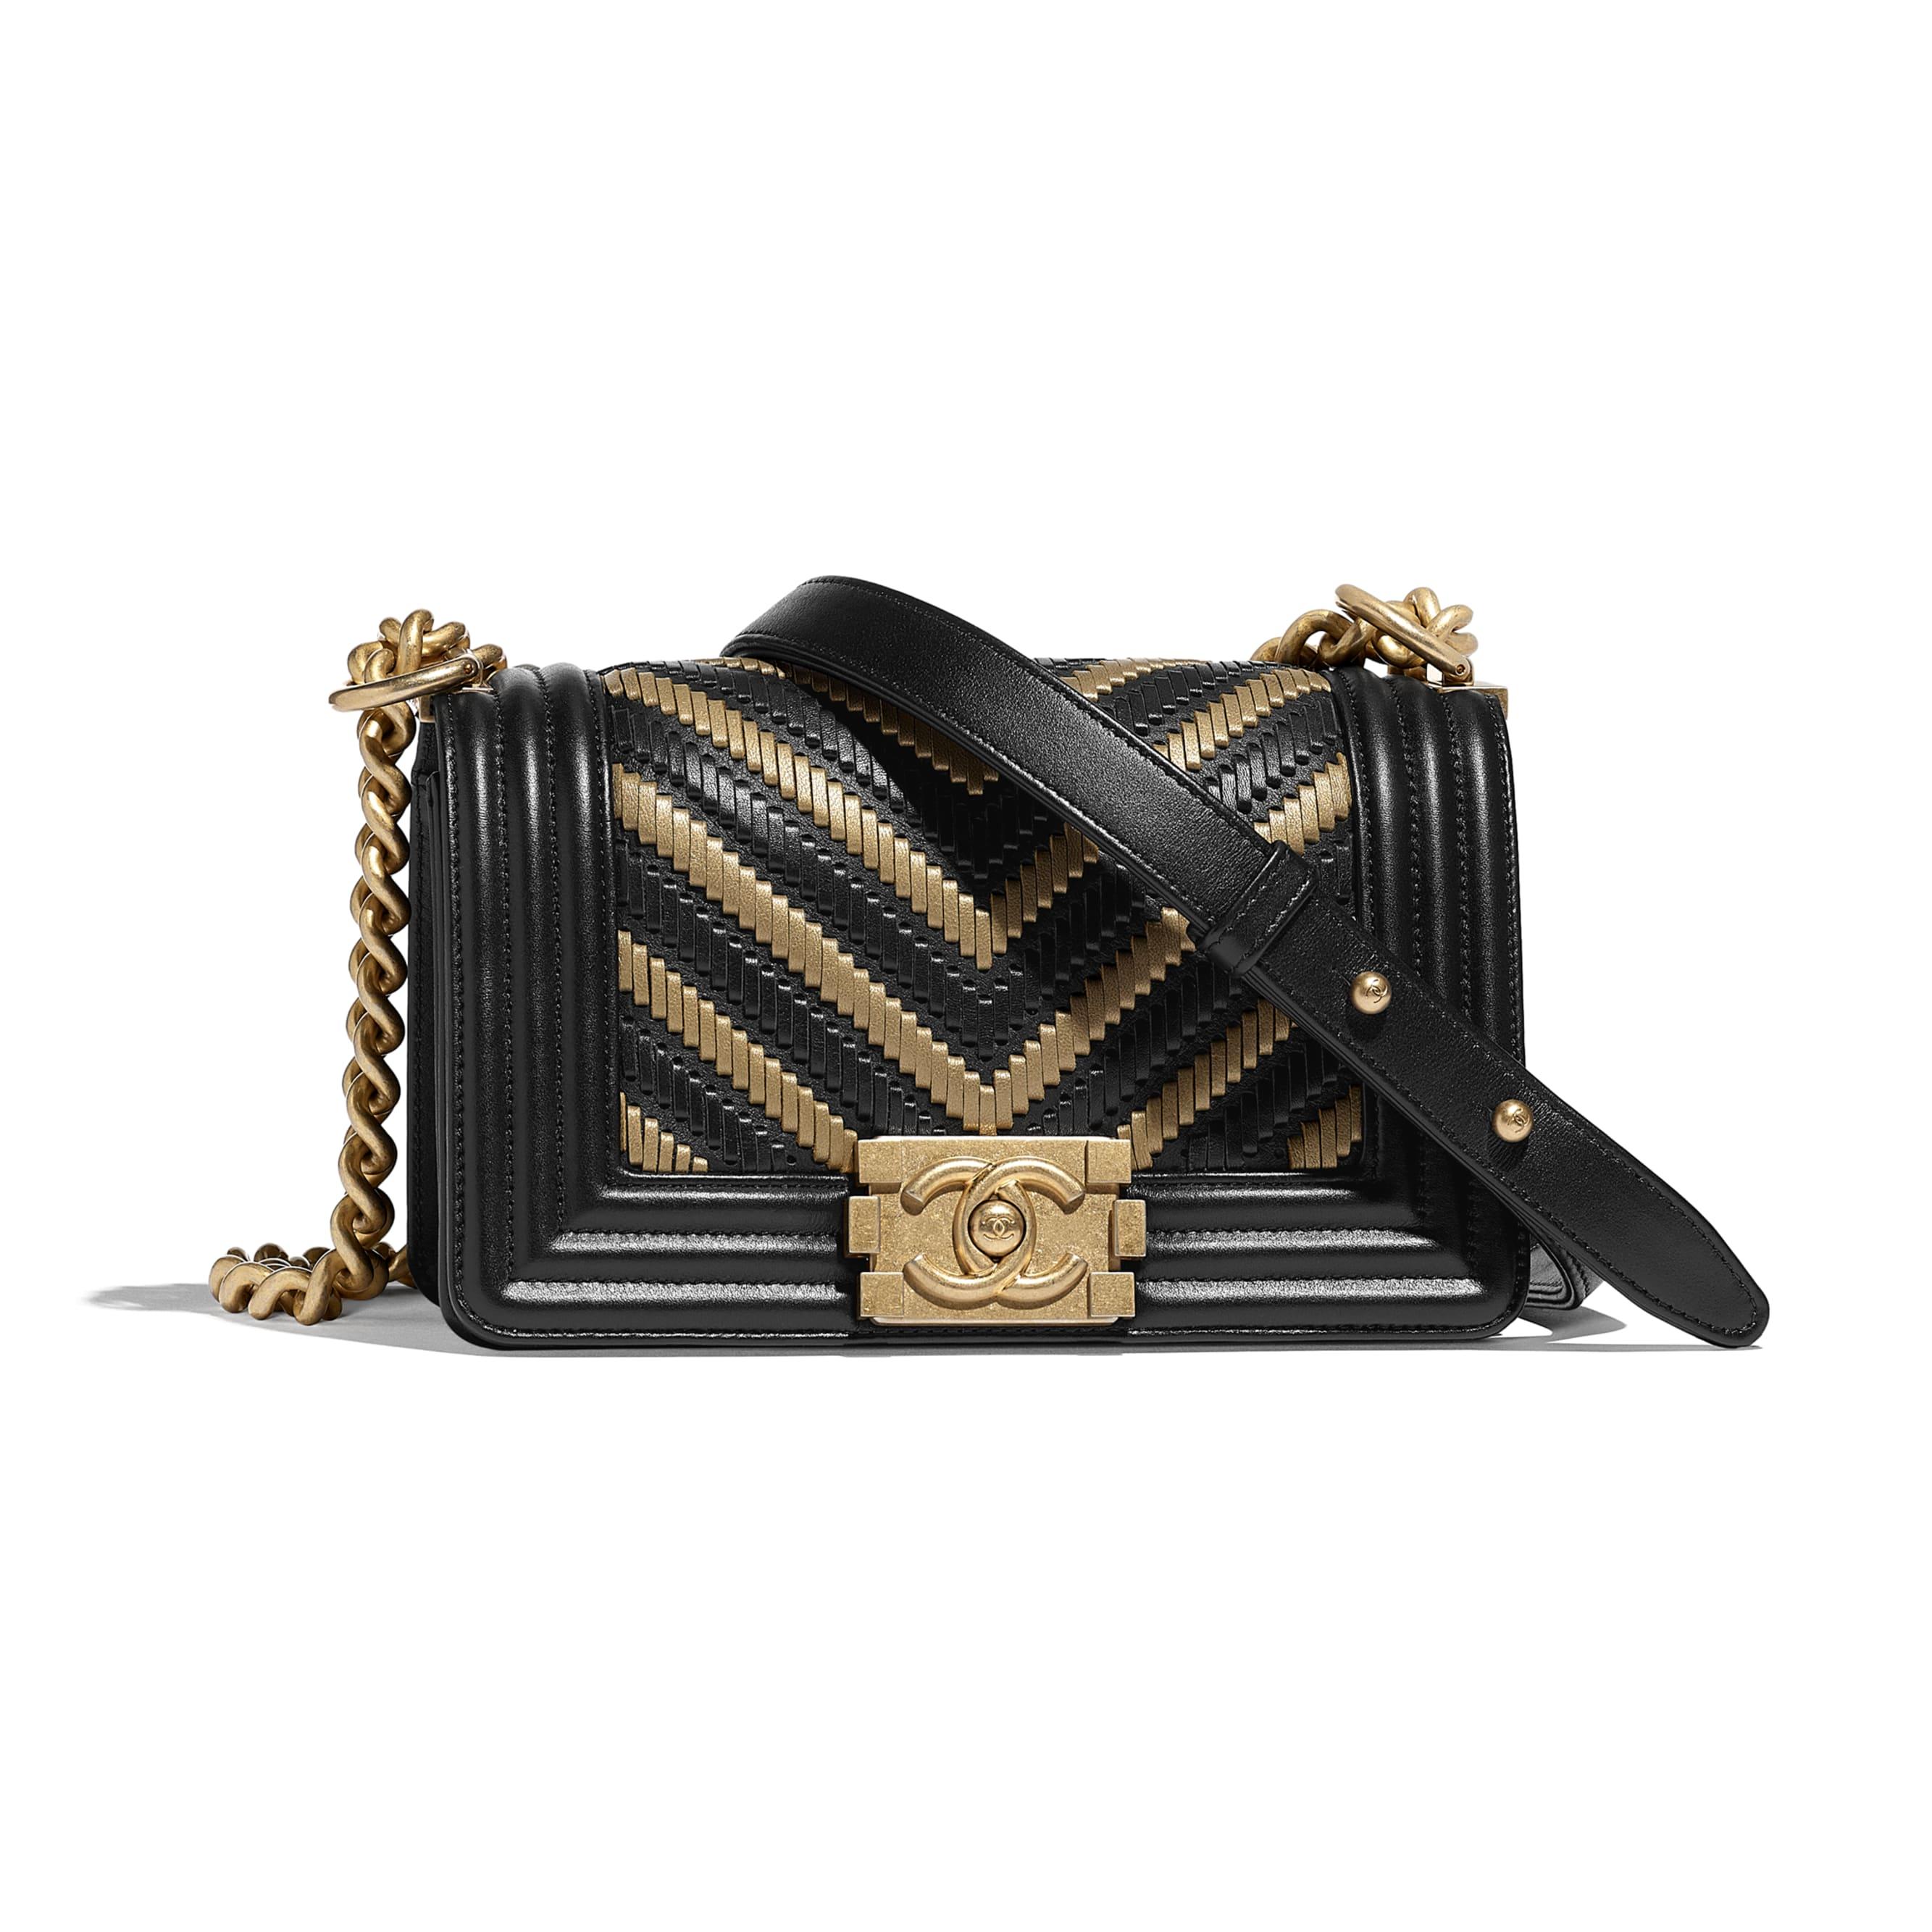 Small BOY CHANEL Handbag - Black & Gold - Metallic Lambskin, Calfskin & Gold-Tone Metal - Default view - see standard sized version